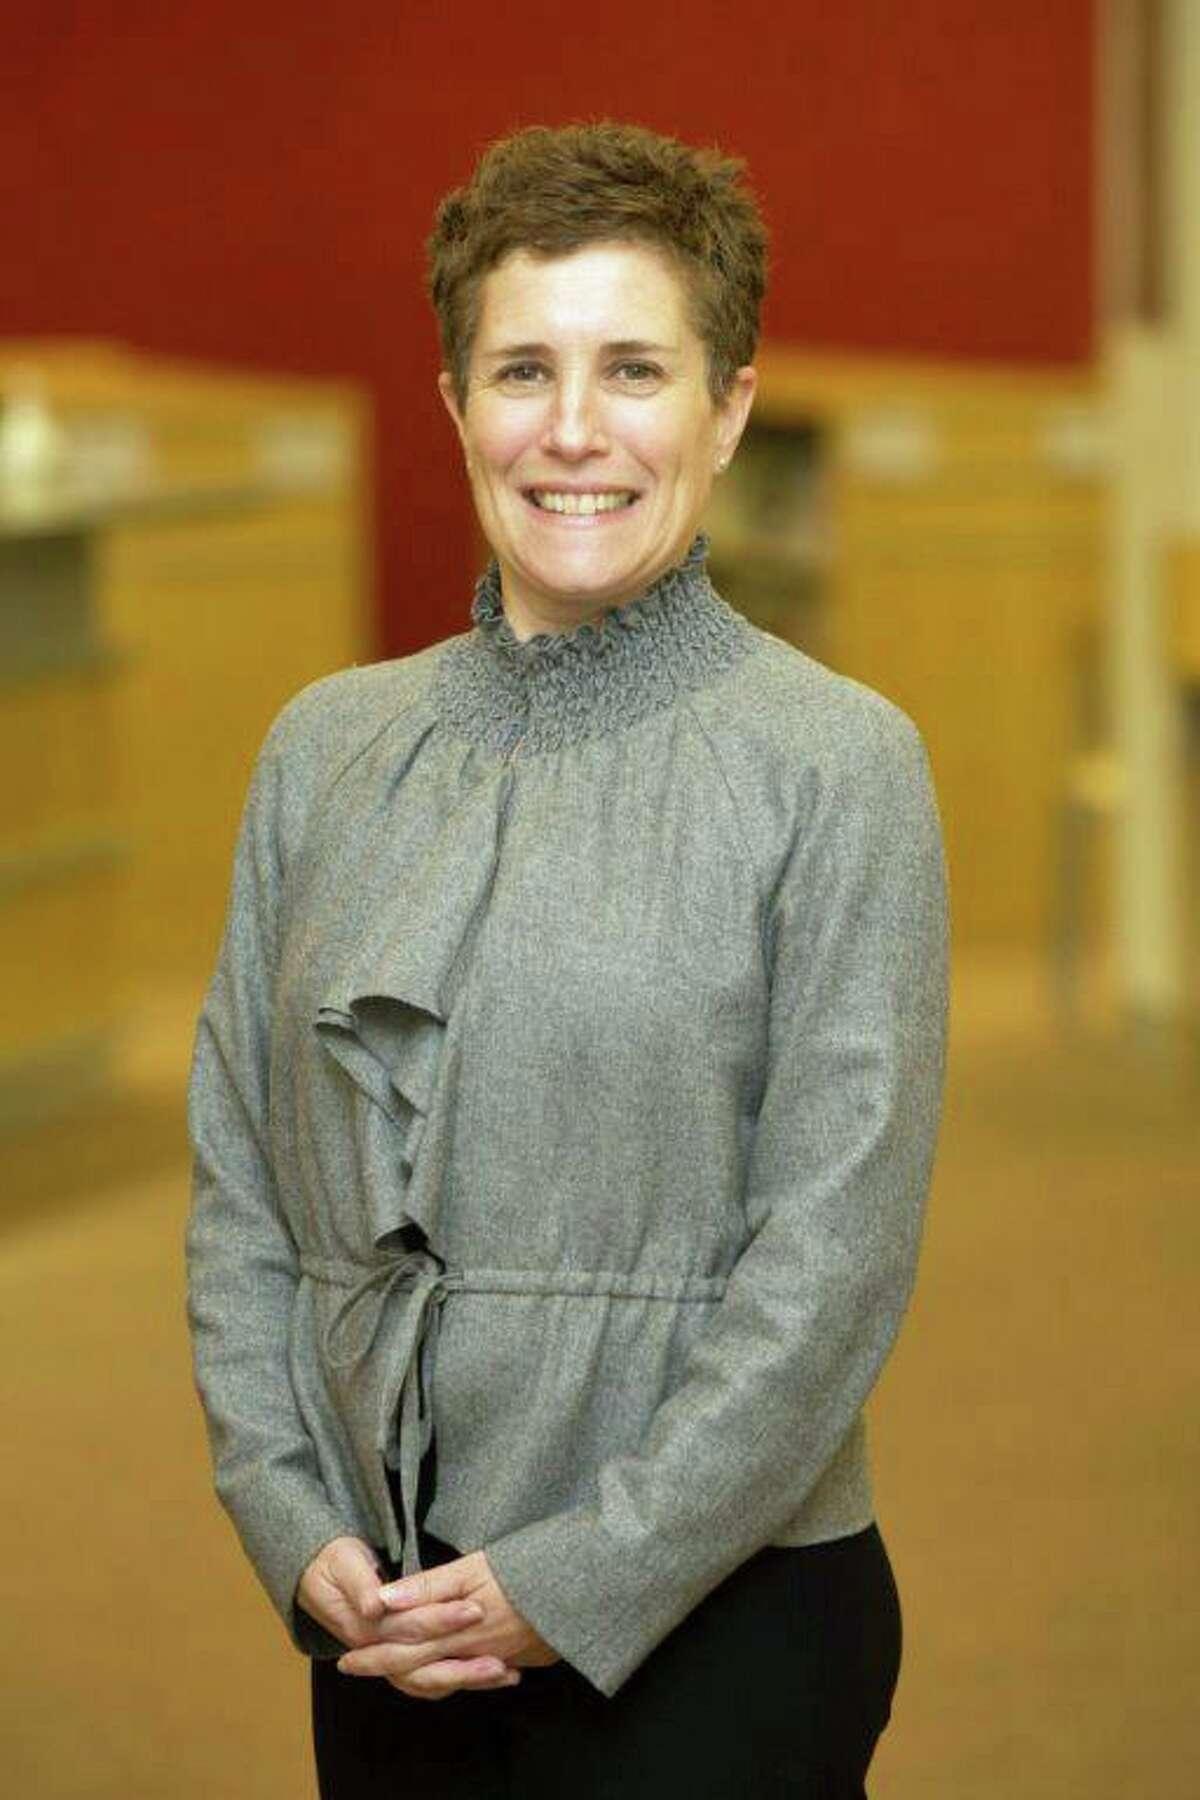 Regional School District 17 Superintendent Holly Hageman is leaving the Haddam-Killingworth system.